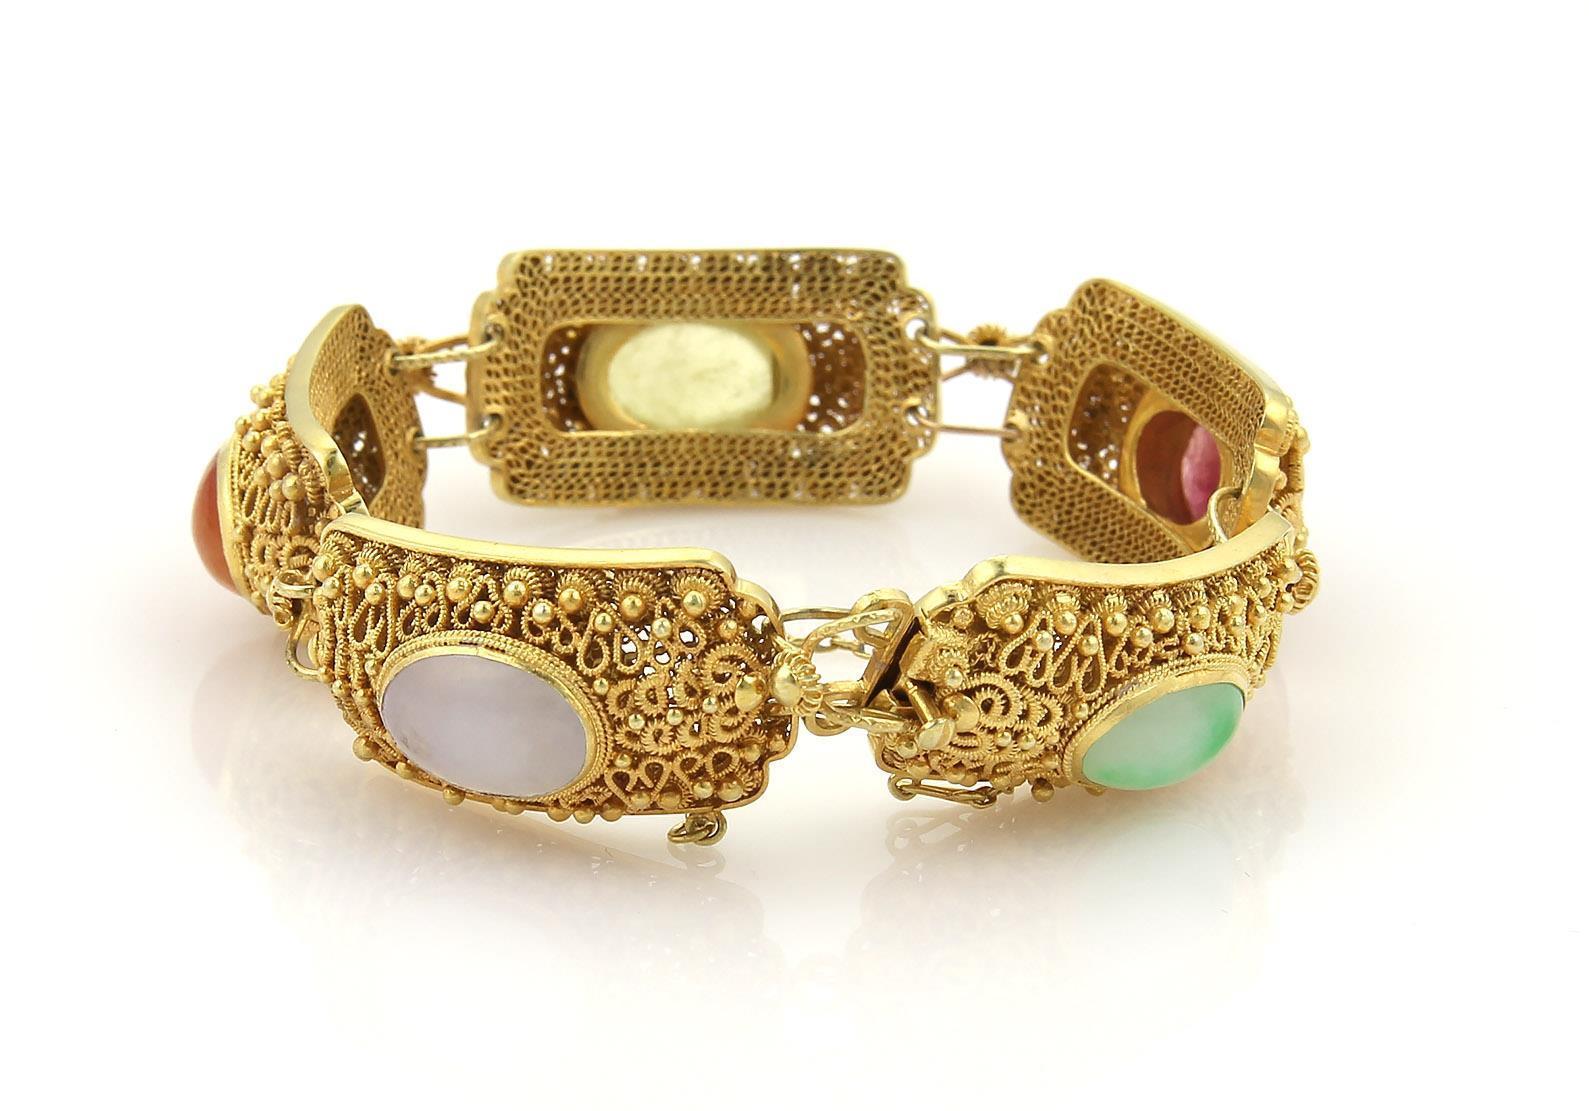 """""14K Yellow Gold Multi-Color Cabochon Jade Fancy Curve Link Bracelet"""""" 265789"